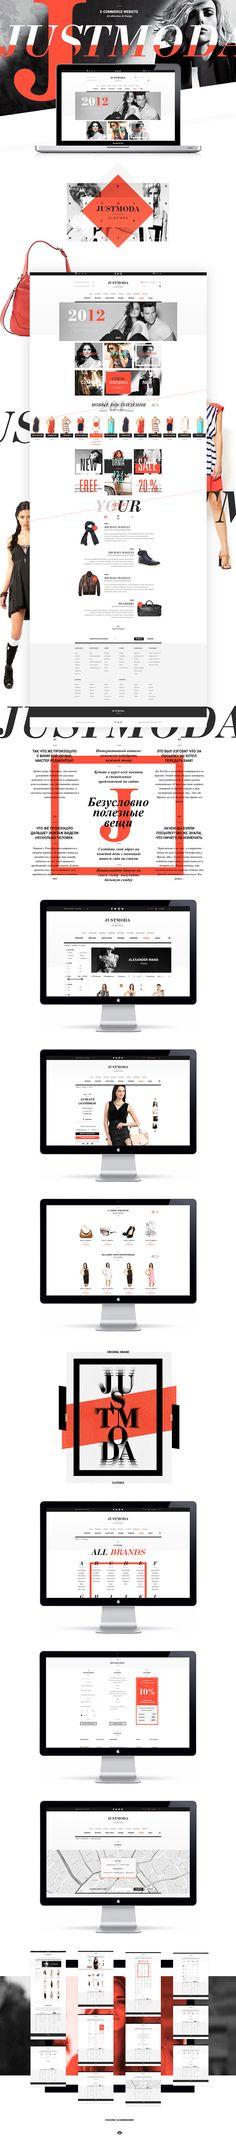 Justmoda web design